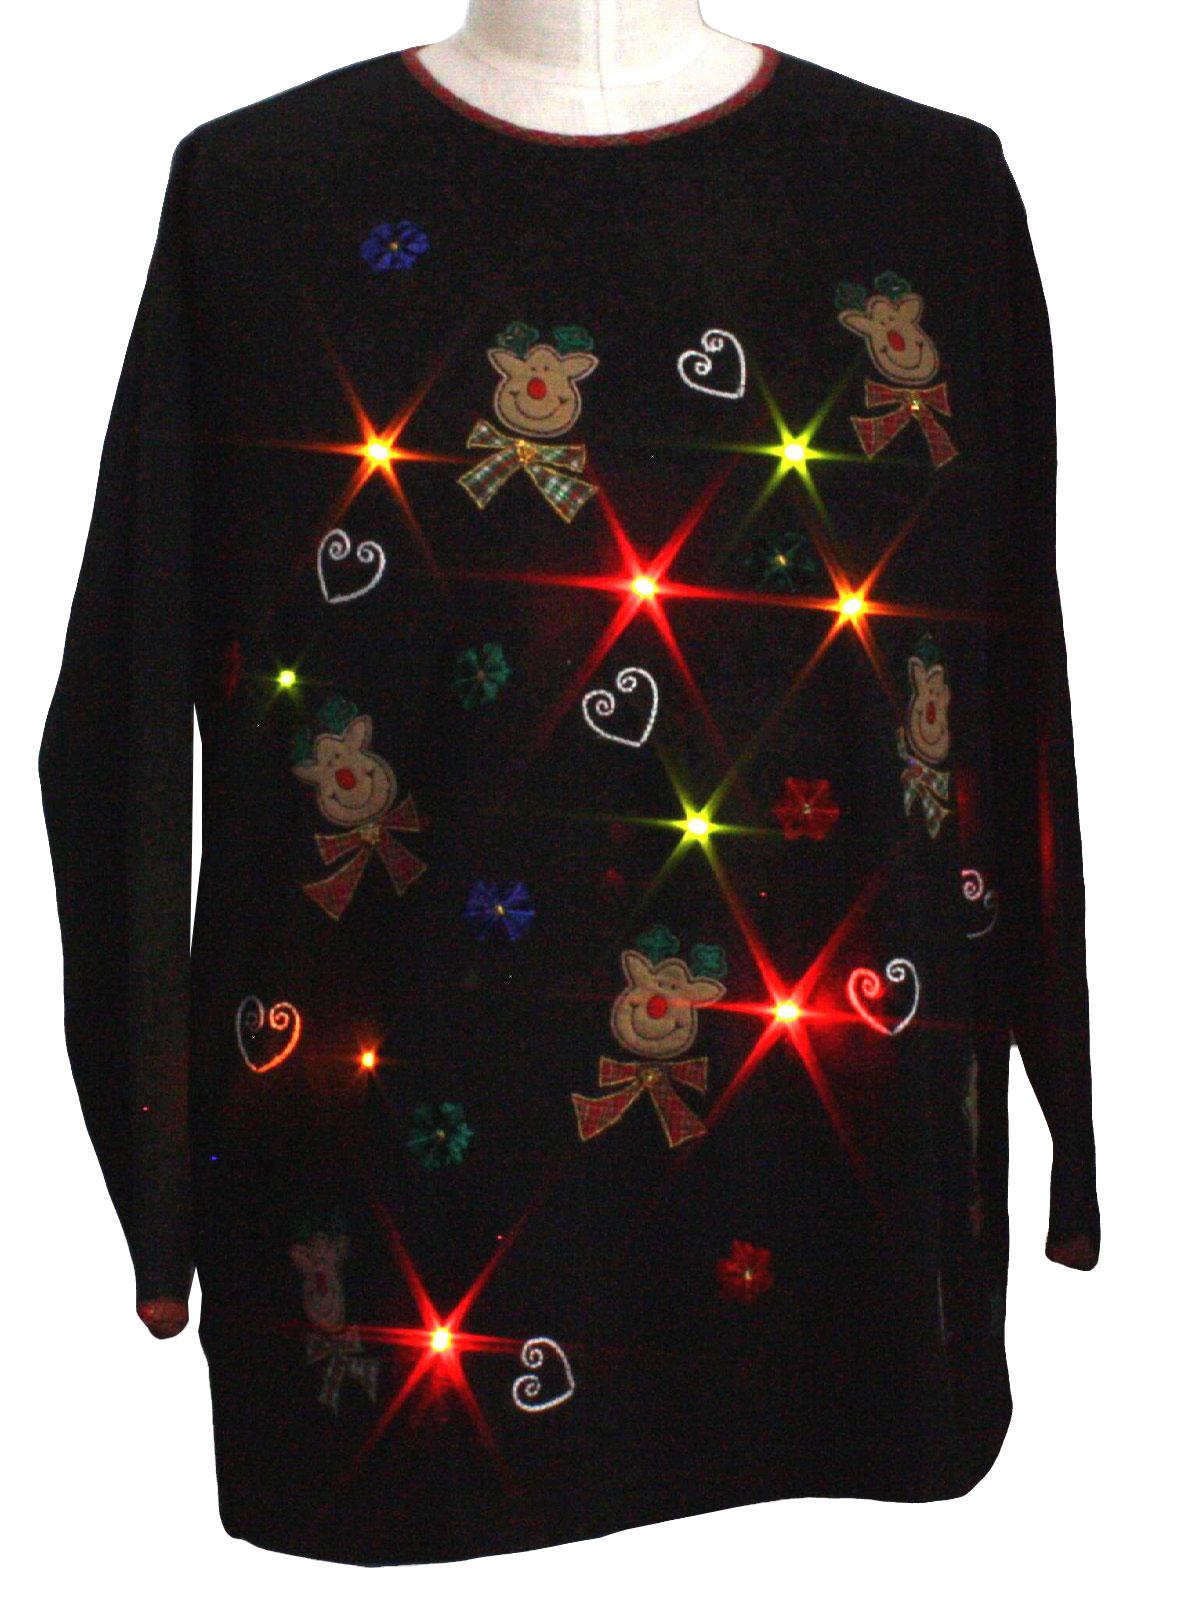 black background cotton polyester blend pullover longsleeve ugly